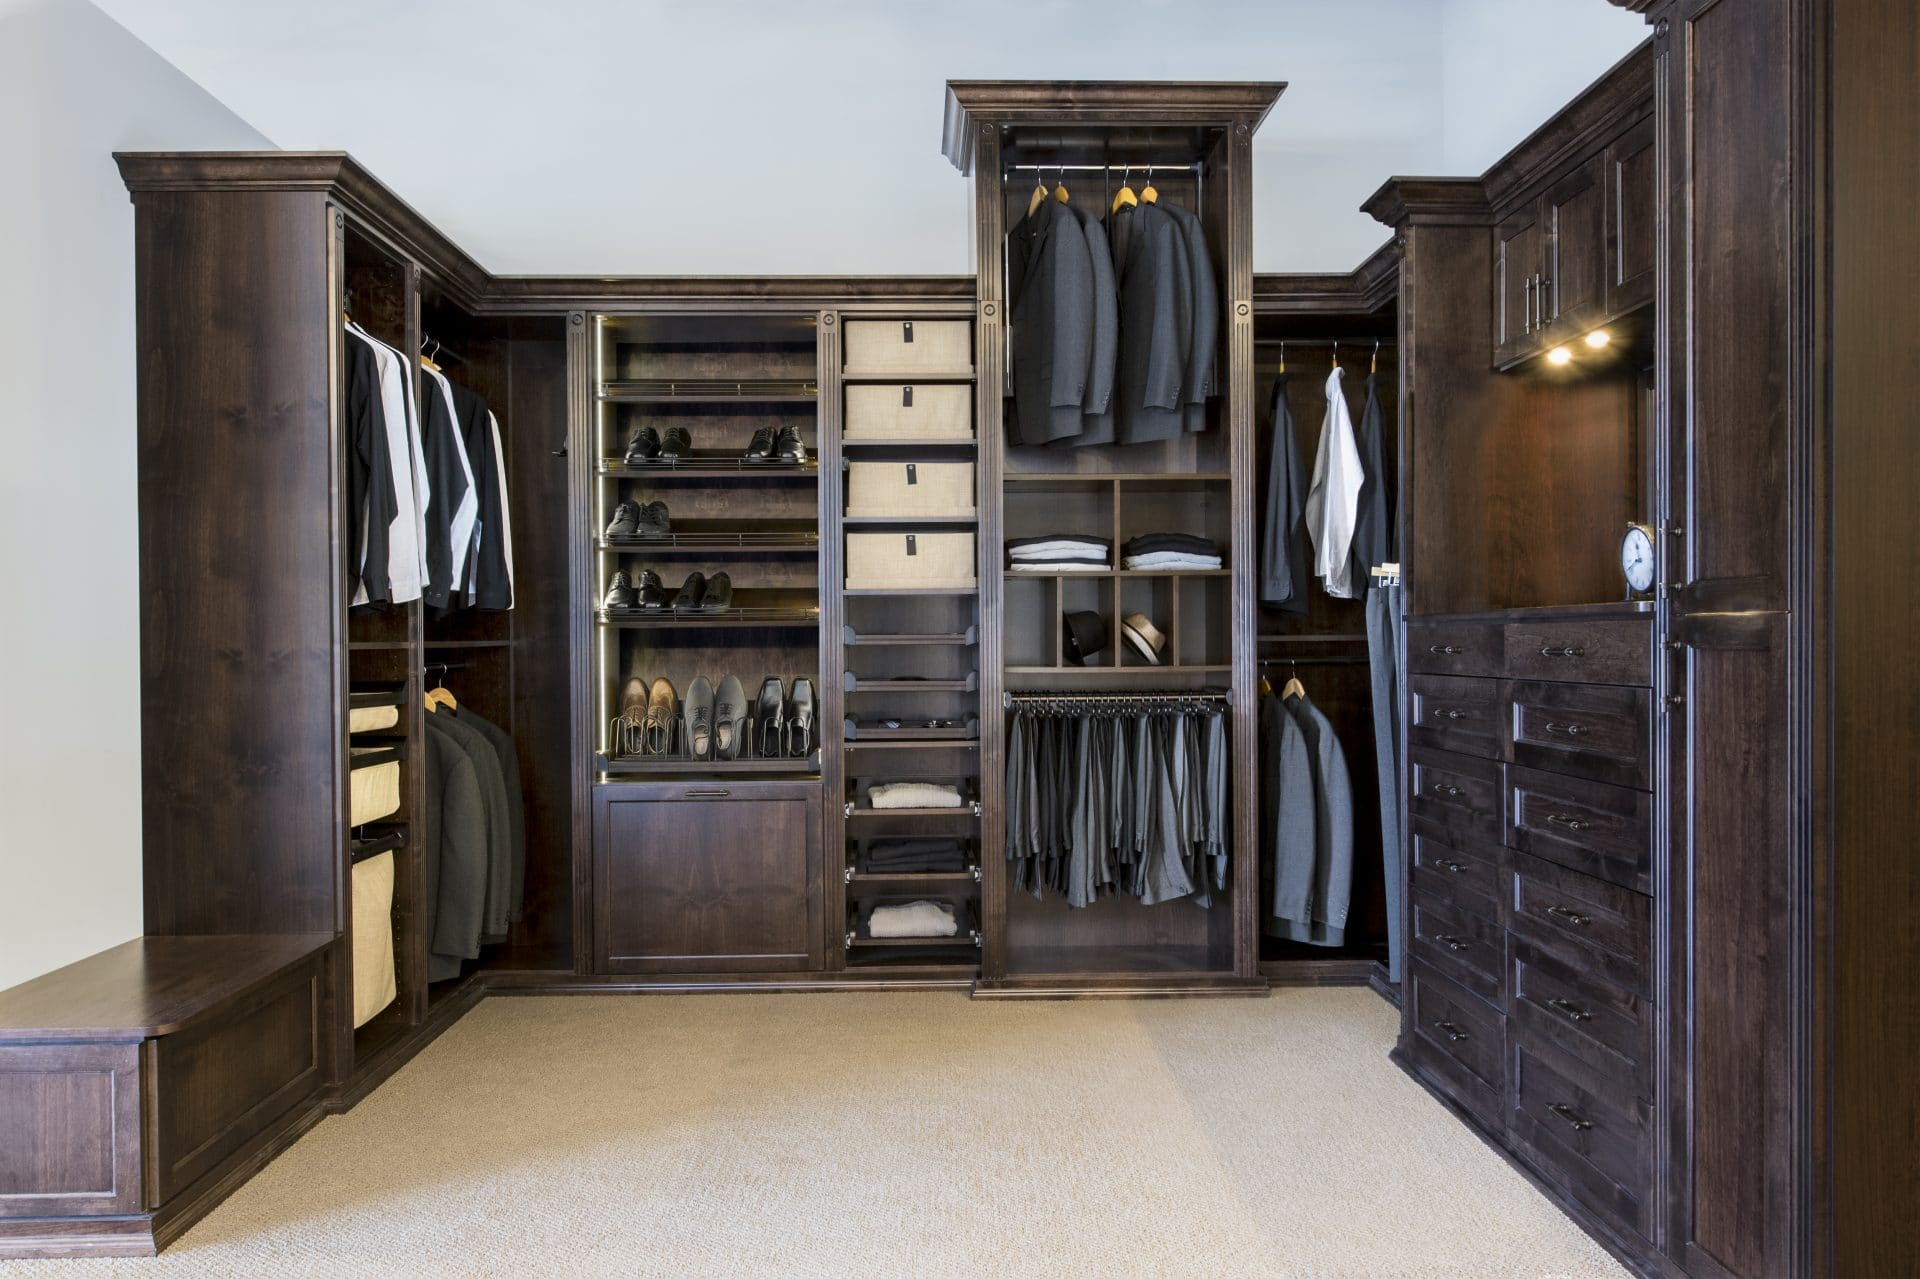 affordable custom closets phoenix az closet designers cabinets rh austinmorganclosets com Closed Closets Designs Closet Design